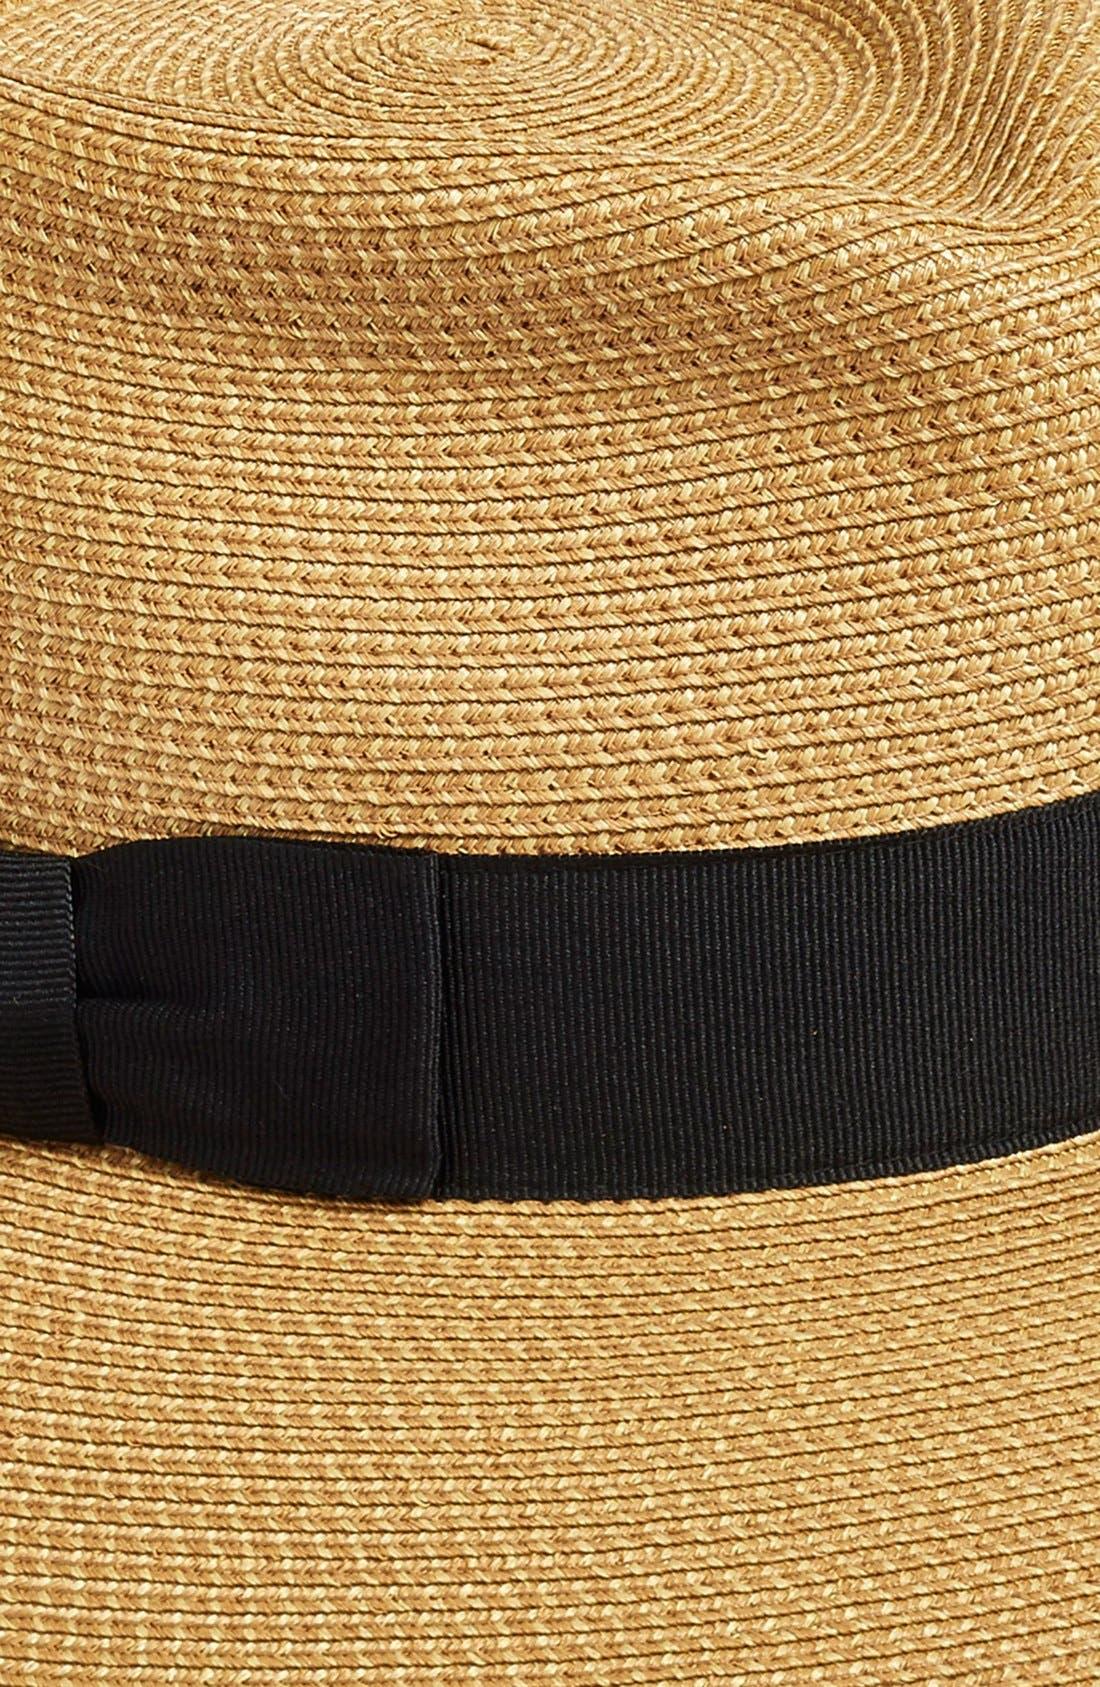 Alternate Image 2  - Eric Javits 'Phoenix' Packable Fedora Sun Hat